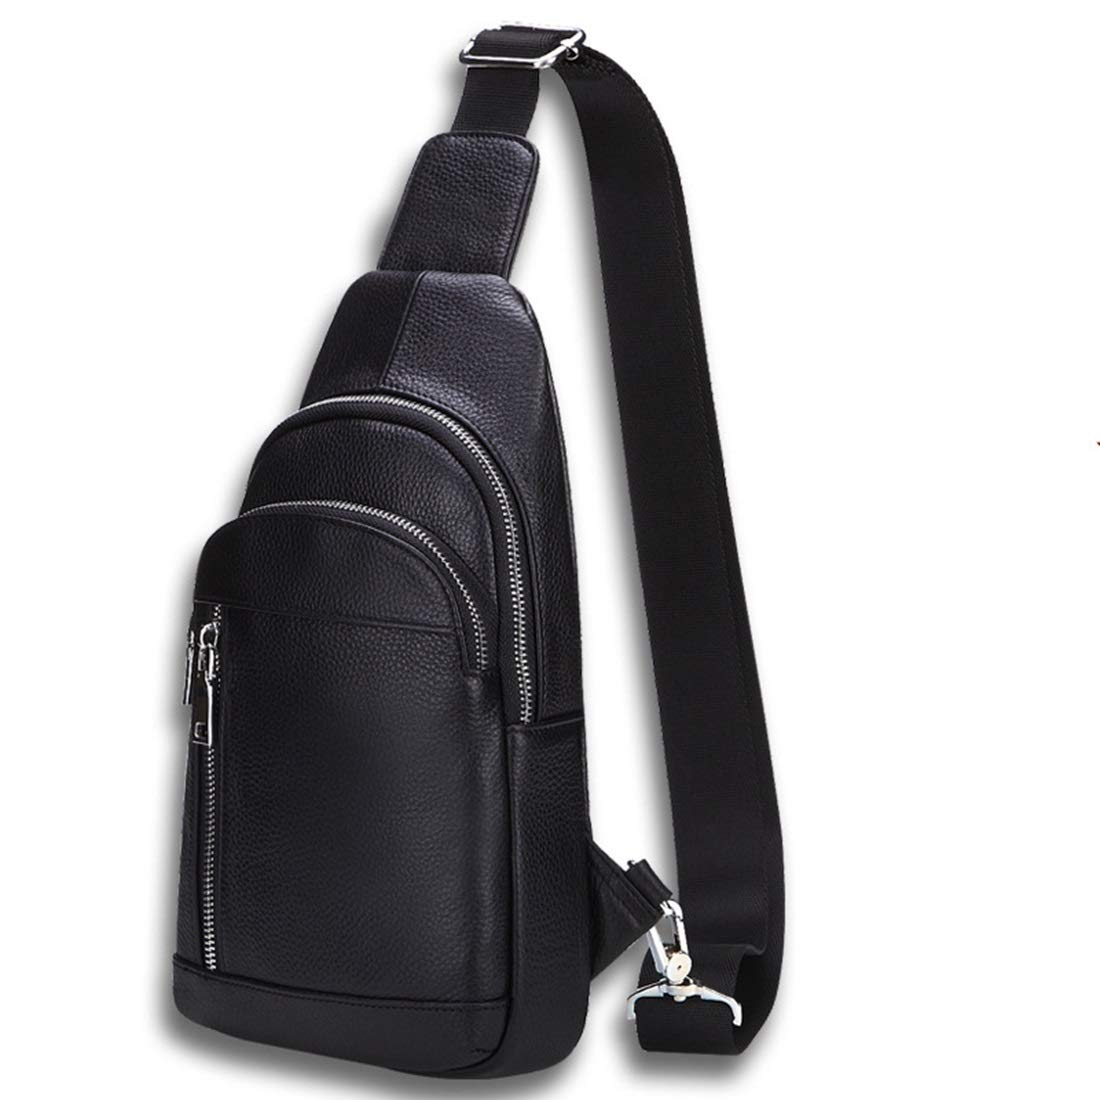 Color : Photo Color Carriemeow Men Chest Bag Genuine Leather Leisure Shoulder Bags Chest Bag Cowhide Student Bag